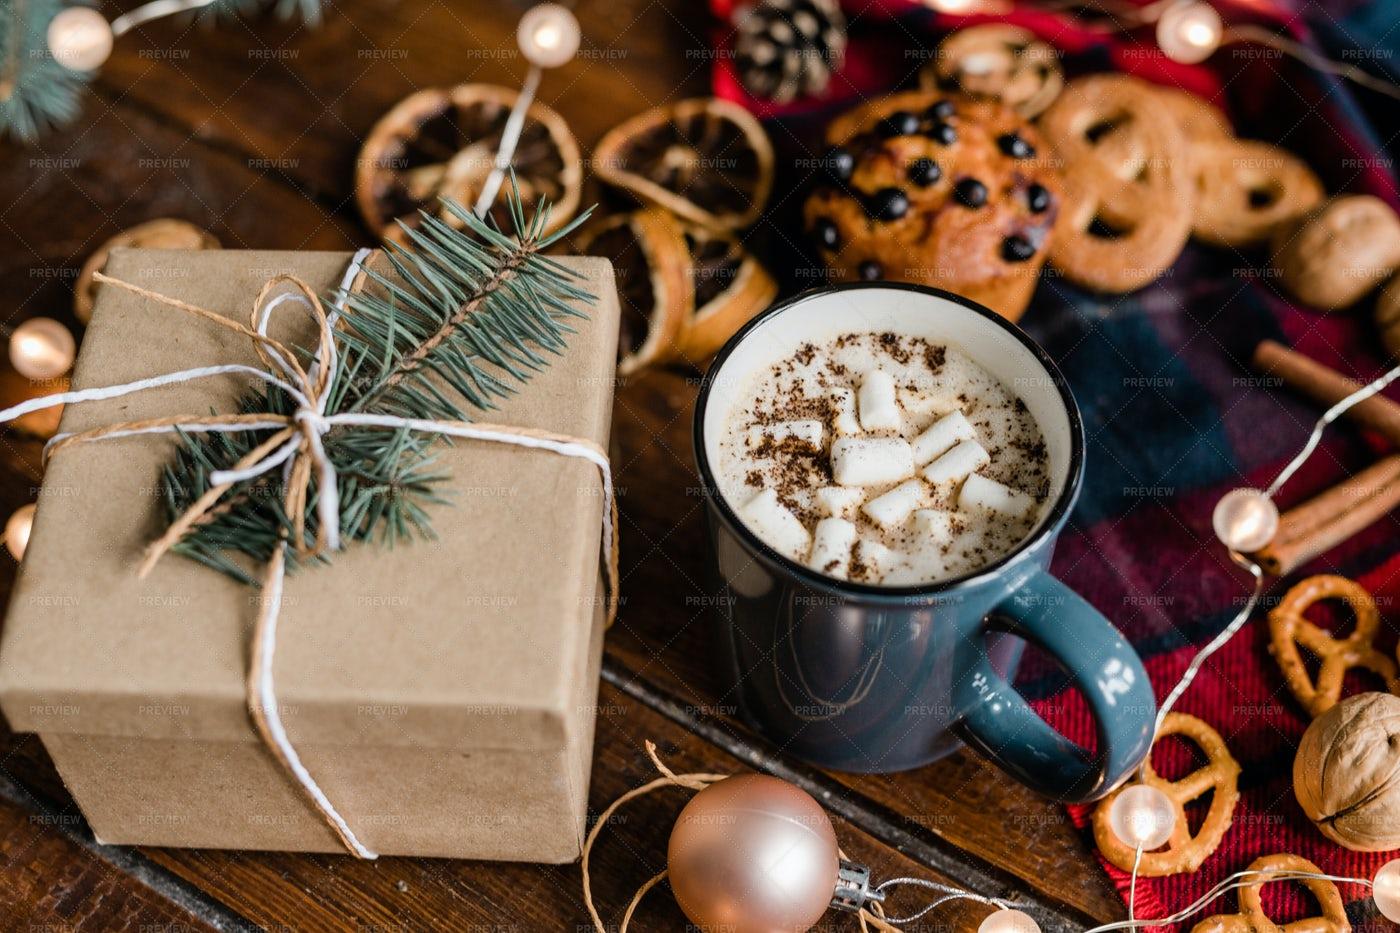 Mug With Hot Coffee, Giftbox With...: Stock Photos